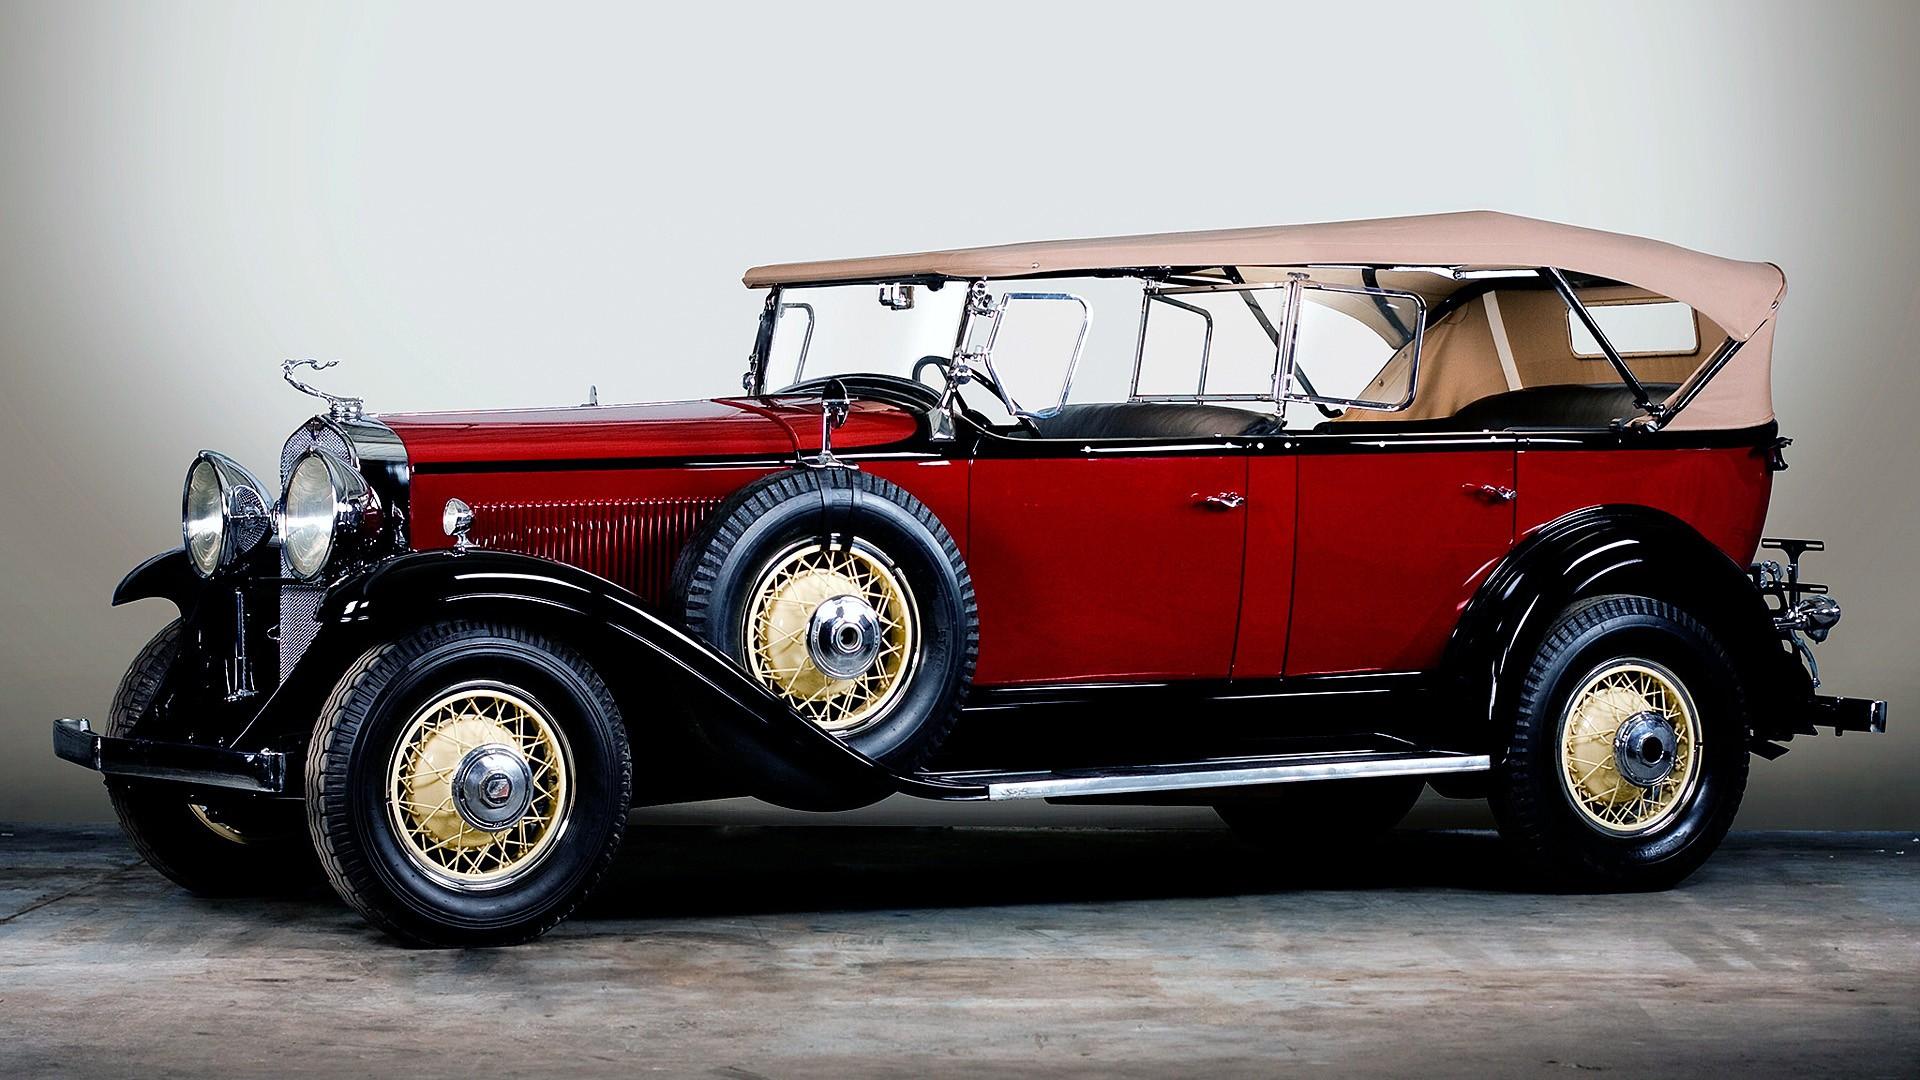 vintage cars wallpapers hd